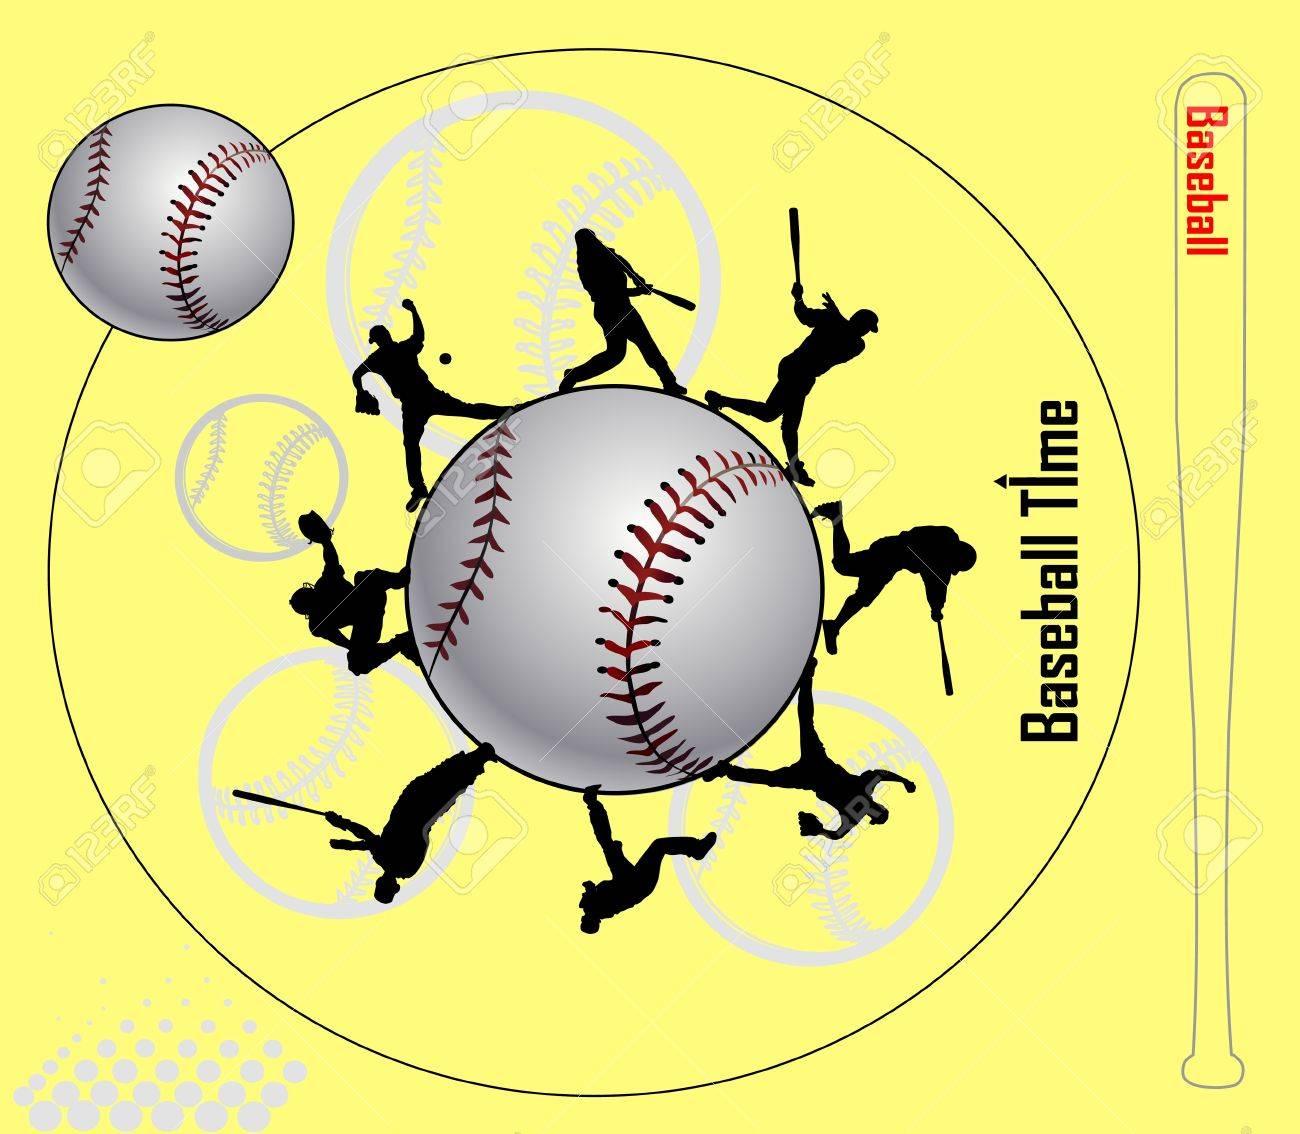 Baseball Illustration Stock Vector - 13959702